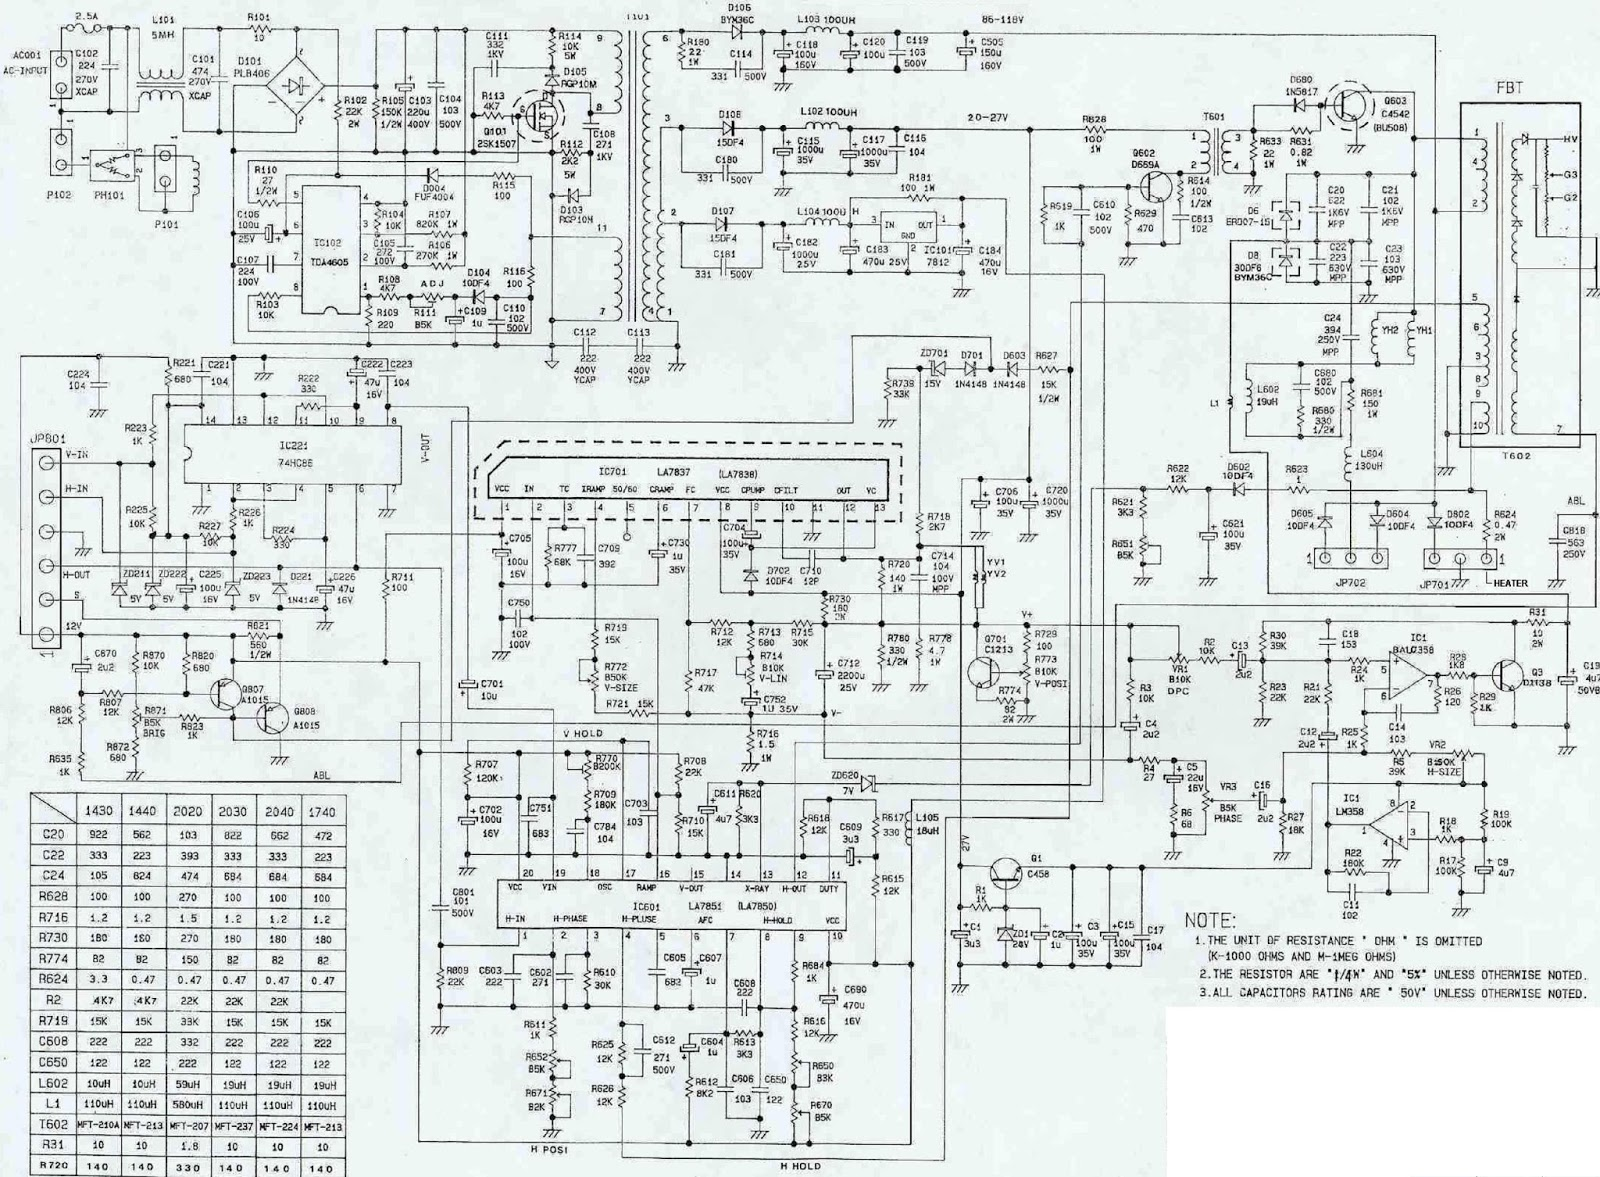 Electro help: SONY PLAYSTATION3  SCHEMATIC DIAGRAM